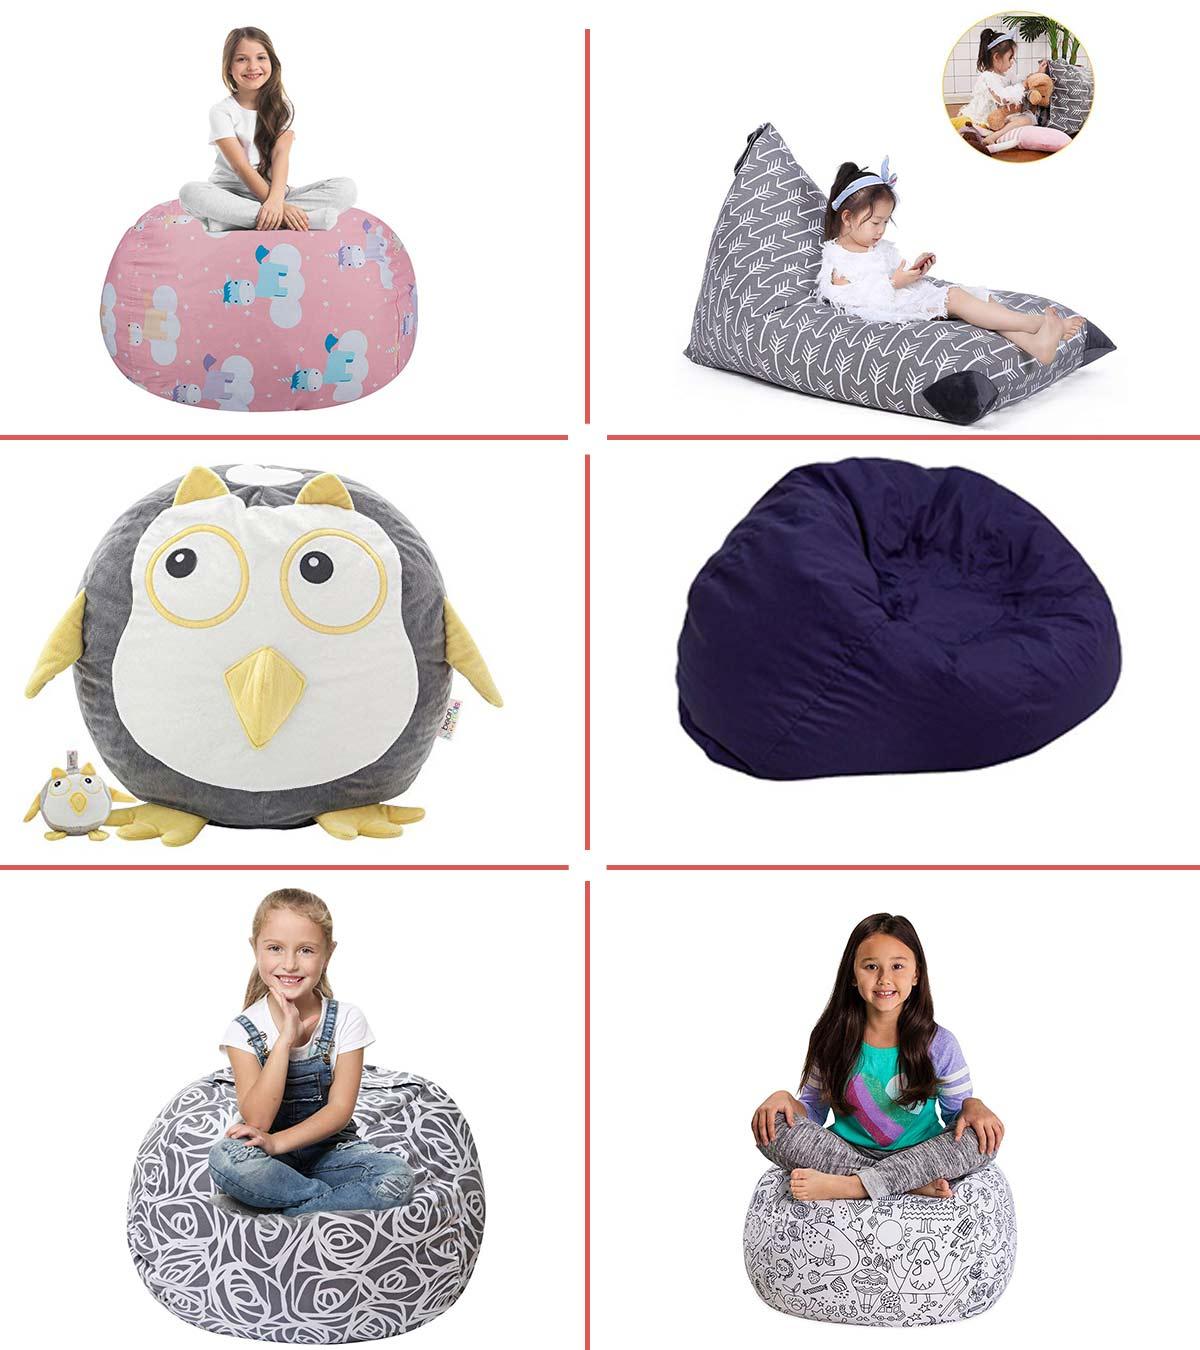 Sensational 11 Best Bean Bags For Kids To Buy In 2019 Andrewgaddart Wooden Chair Designs For Living Room Andrewgaddartcom